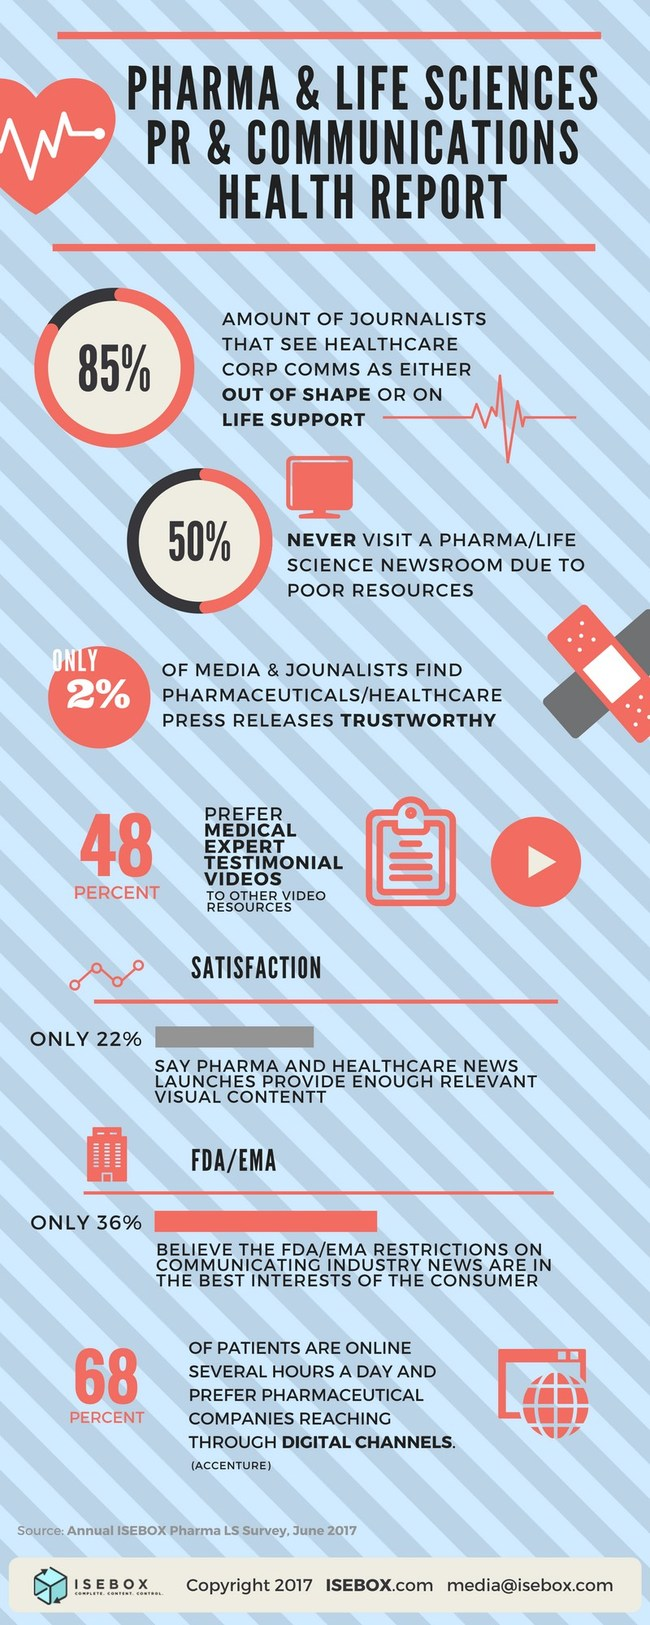 ISEBOX 2017 Annual Survey Pharma and Media / PR Comms